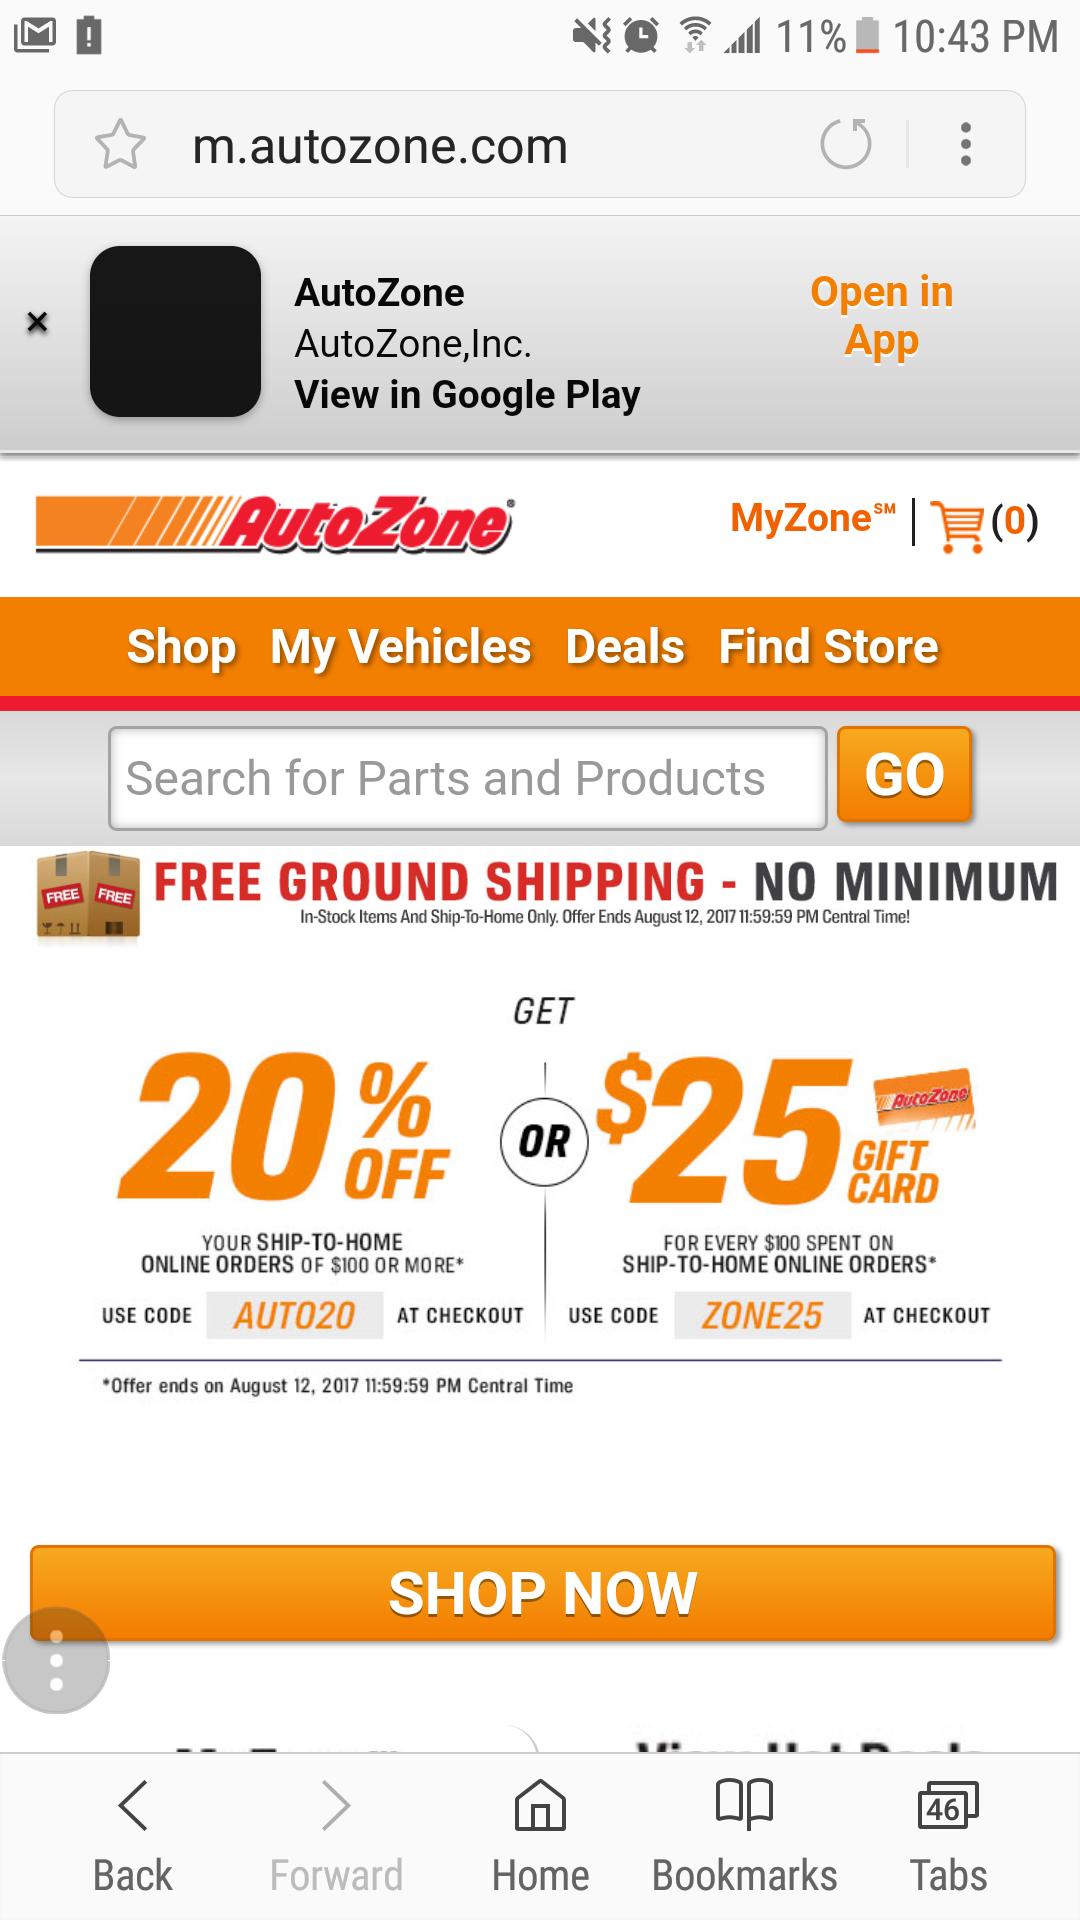 AutoZone Free Shipping - No minimum 0.00